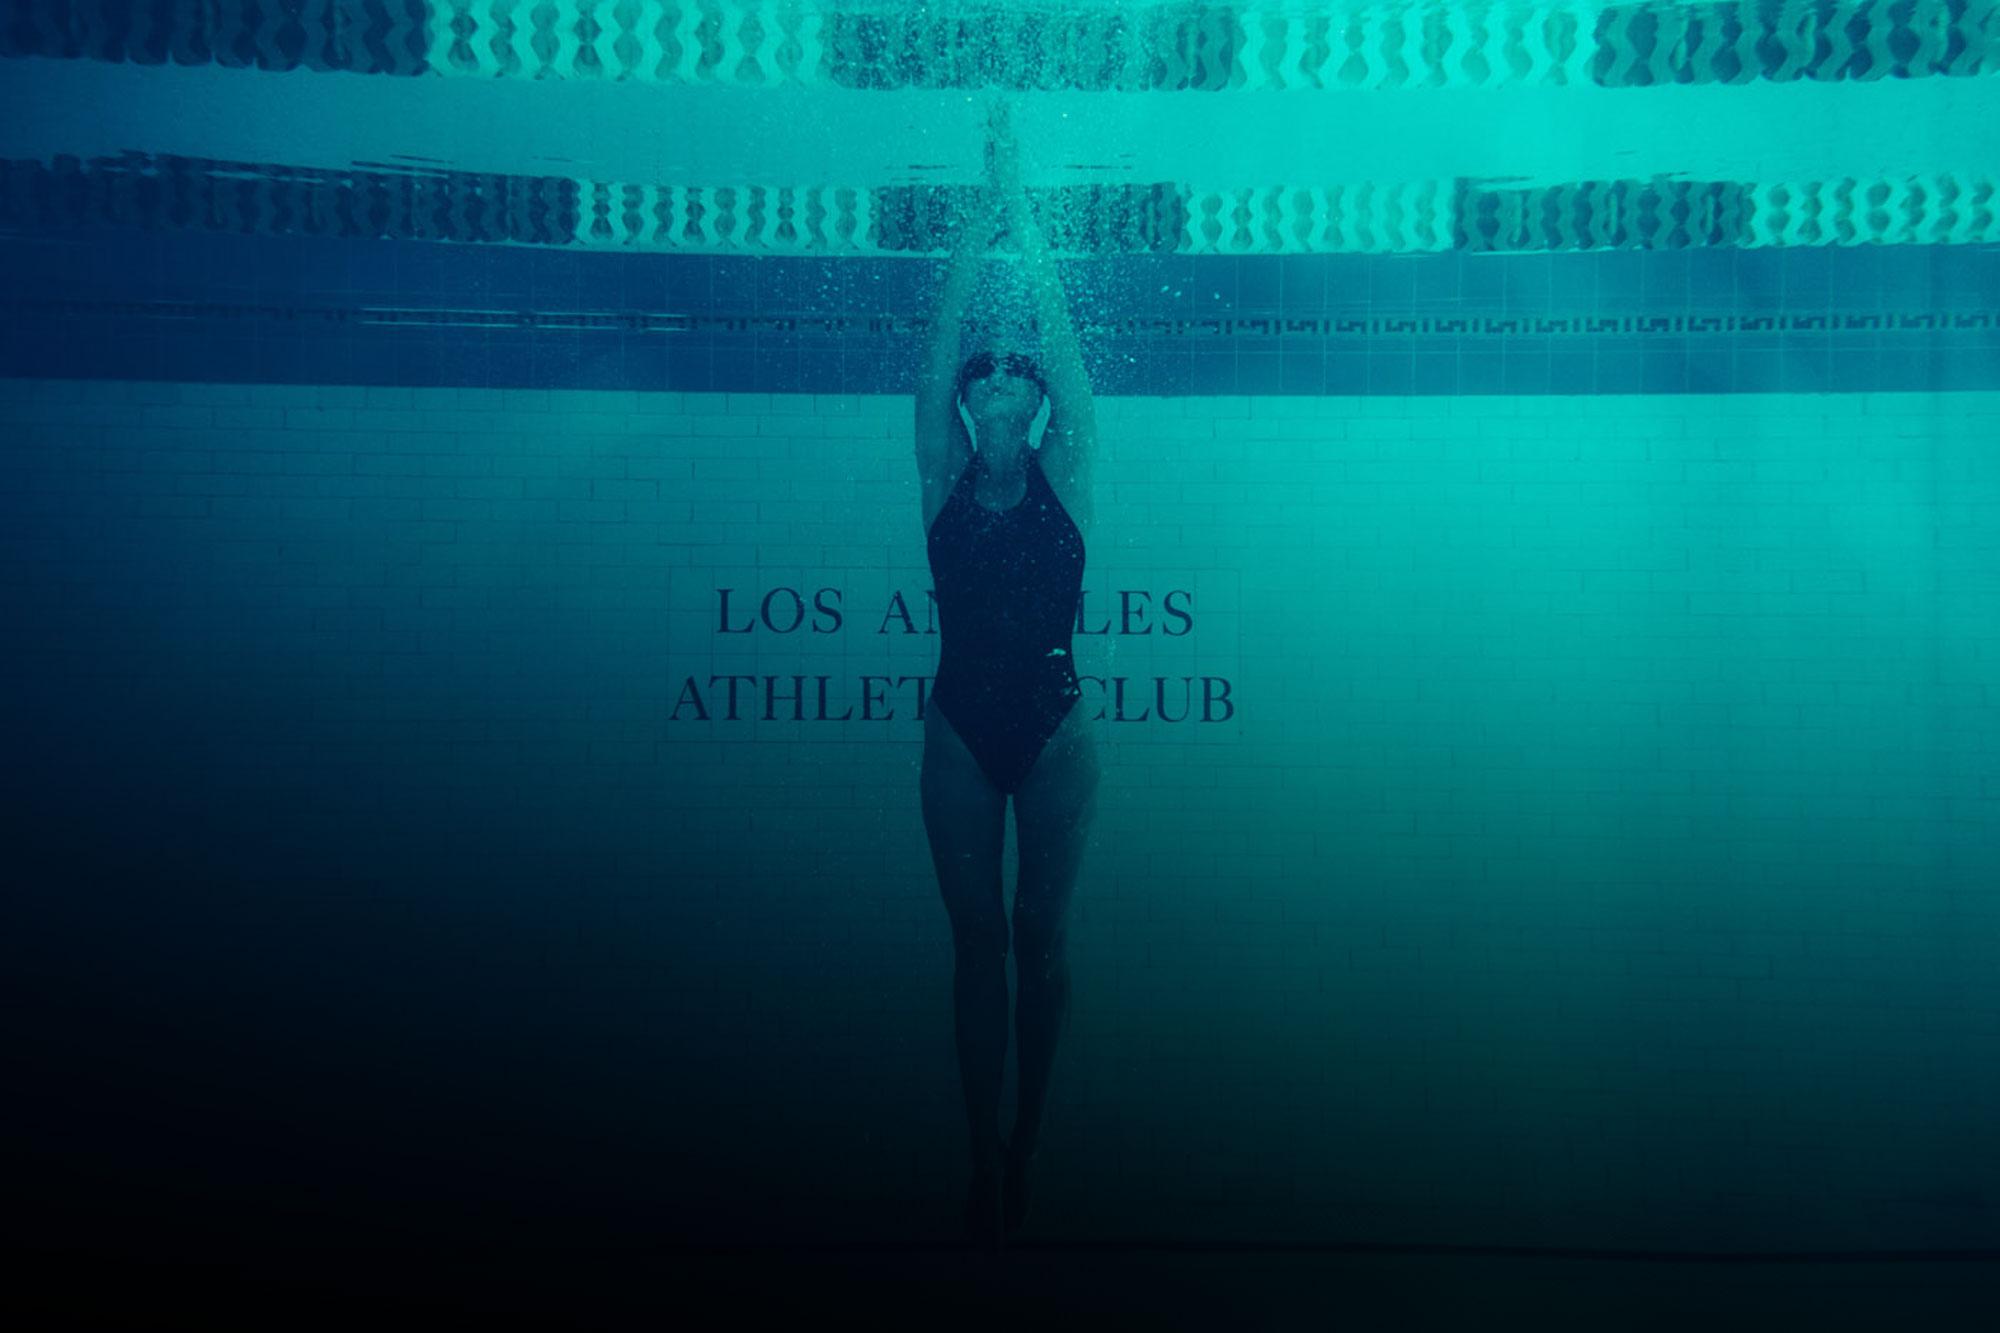 swimming at the la athletic club hotel